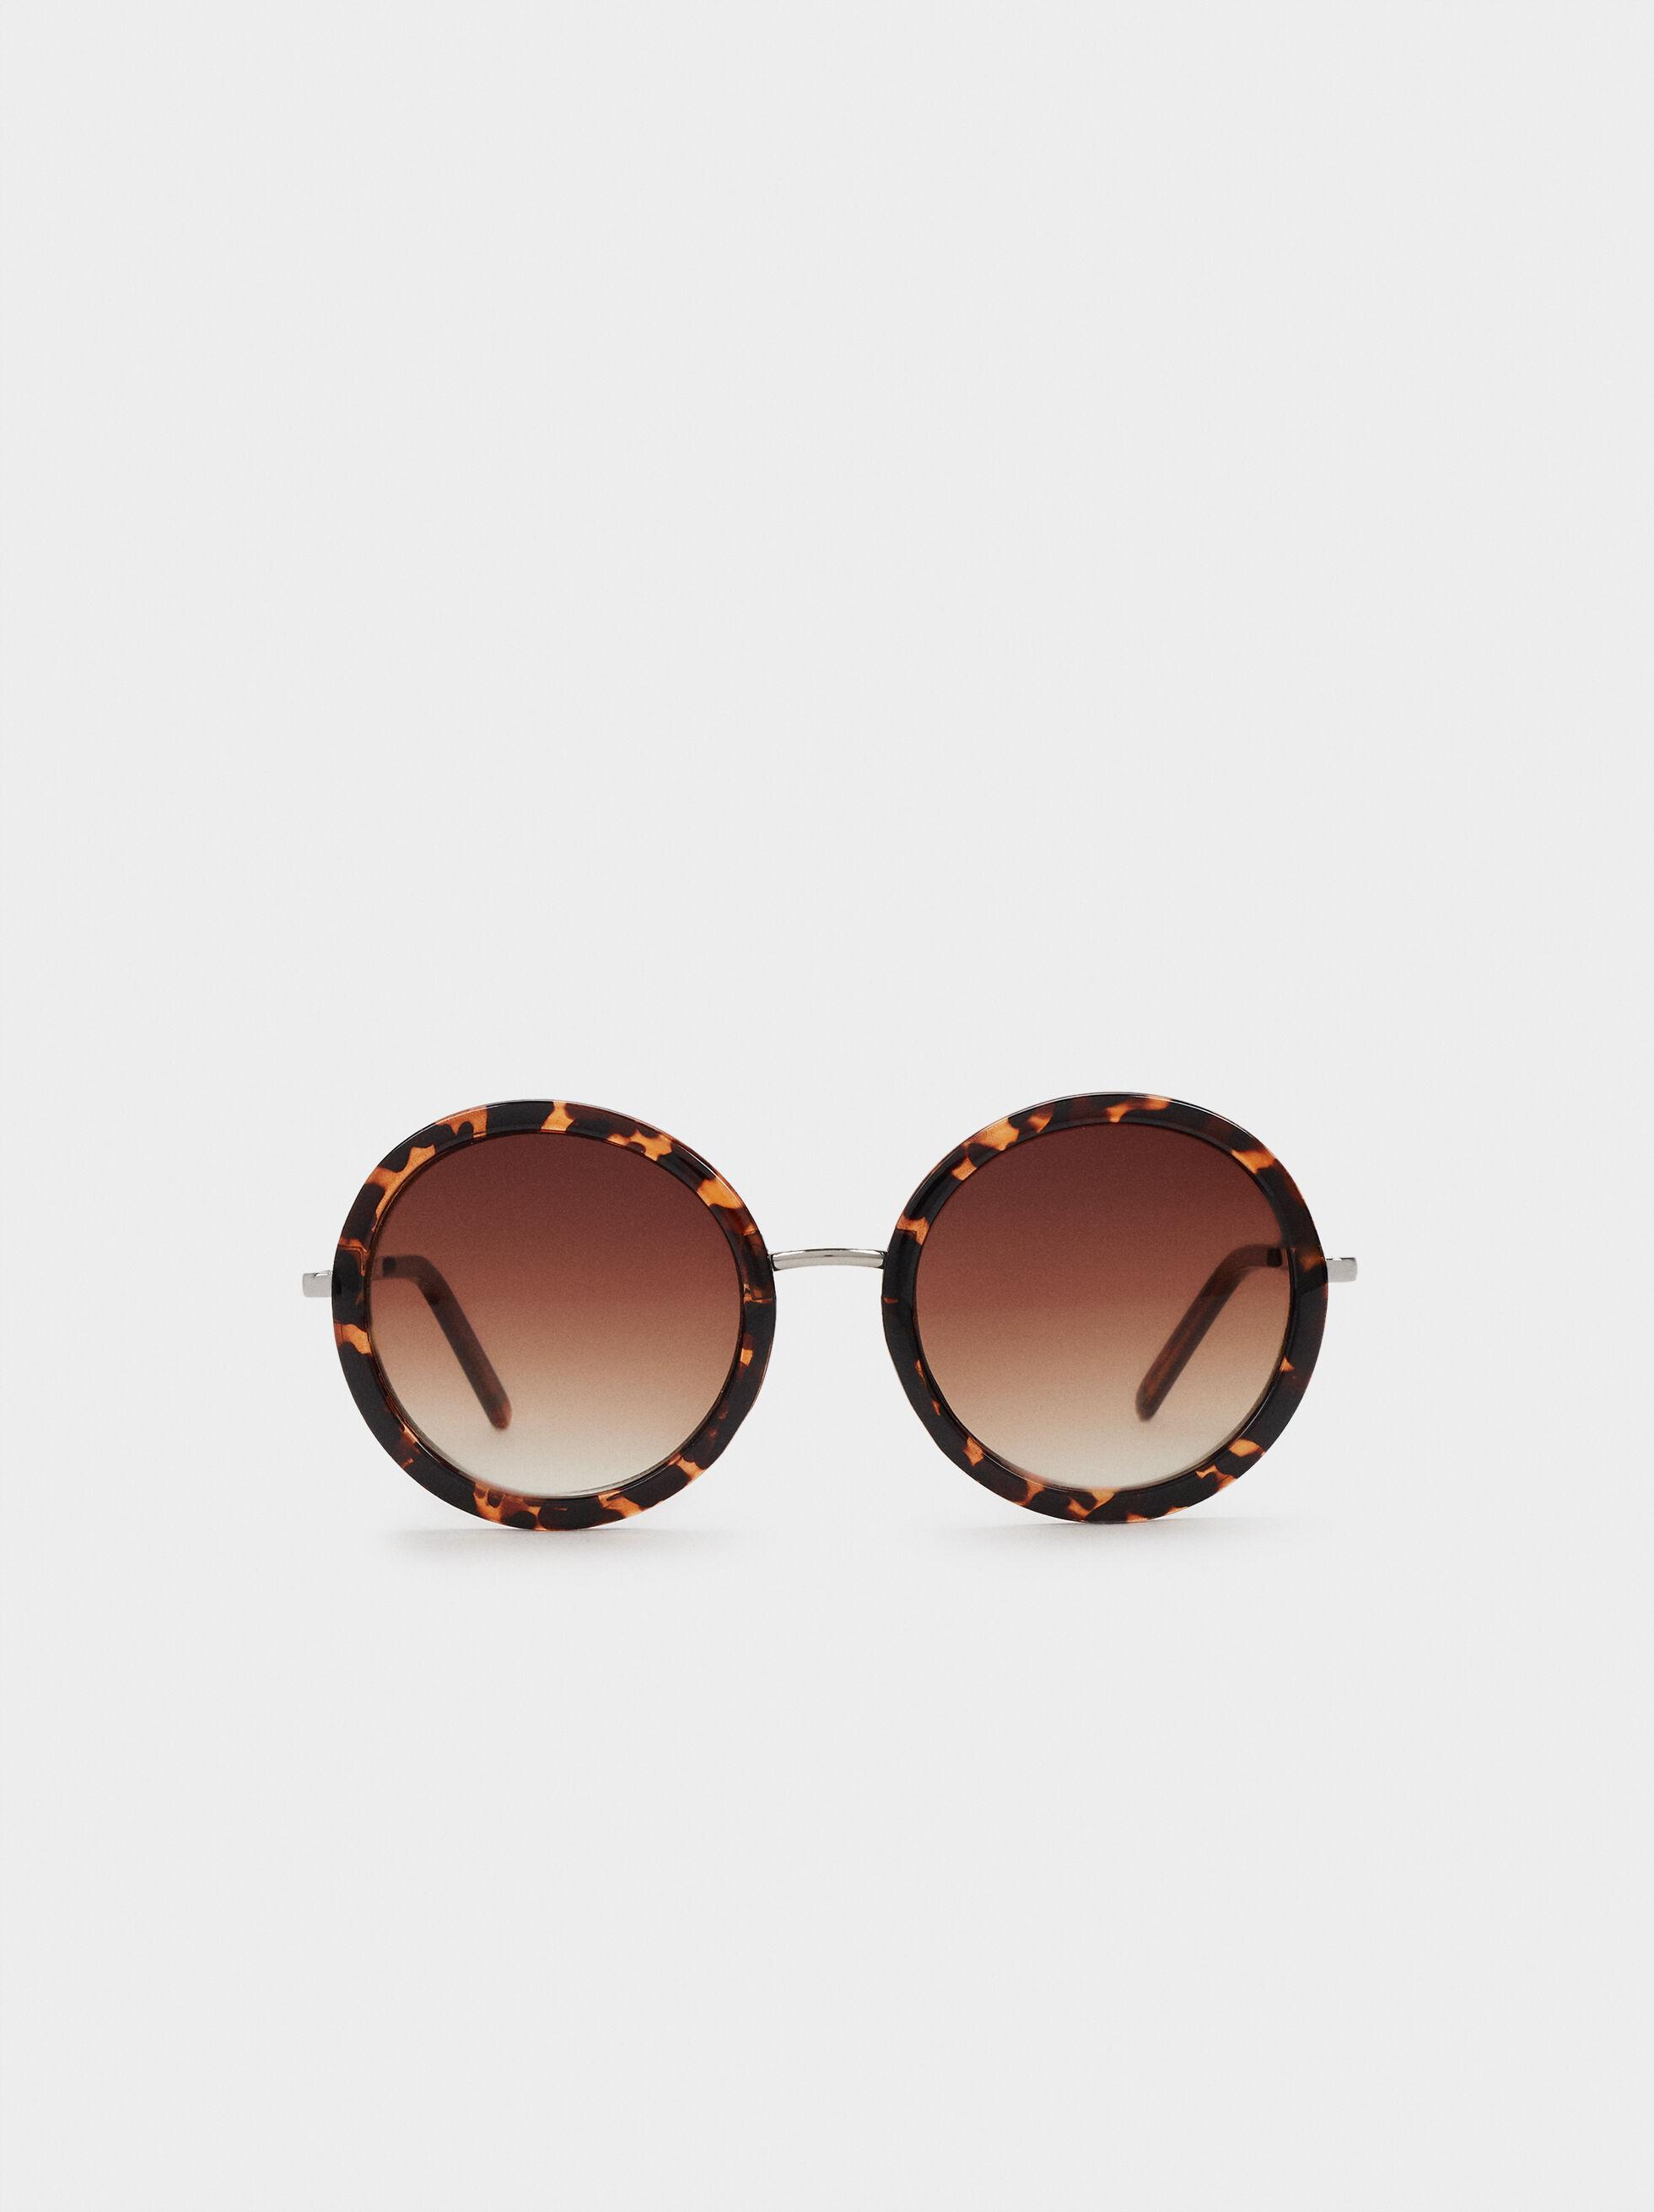 Round Tortoiseshell Sunglasses, Camel, hi-res